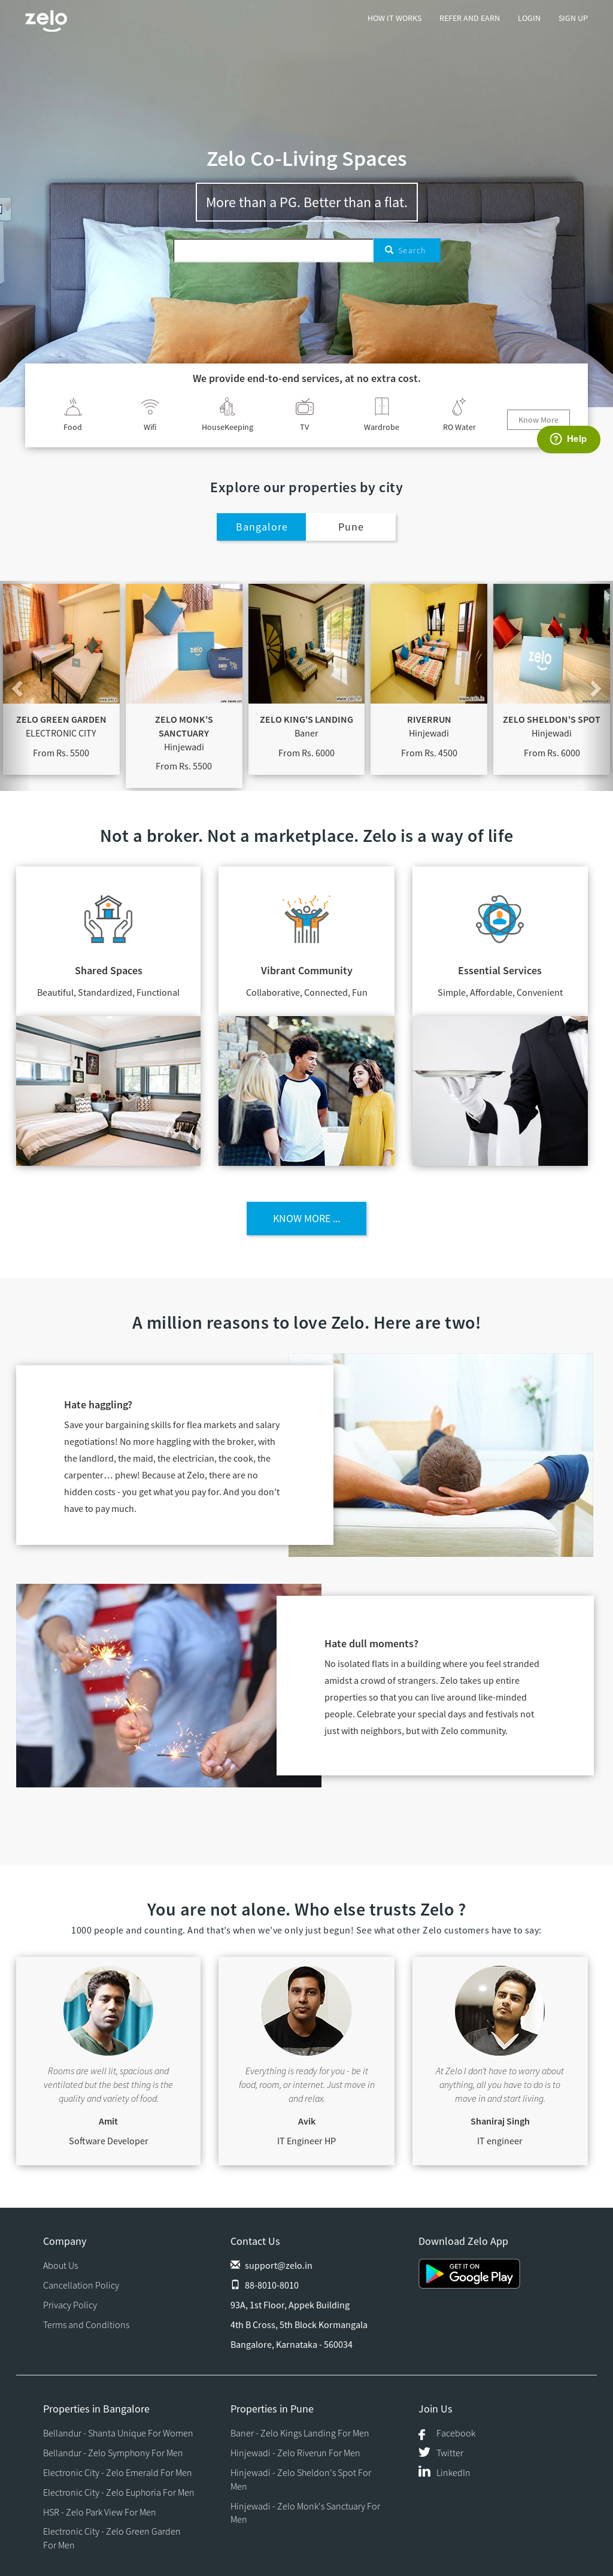 Zolo Competitors, Revenue and Employees - Owler Company Profile